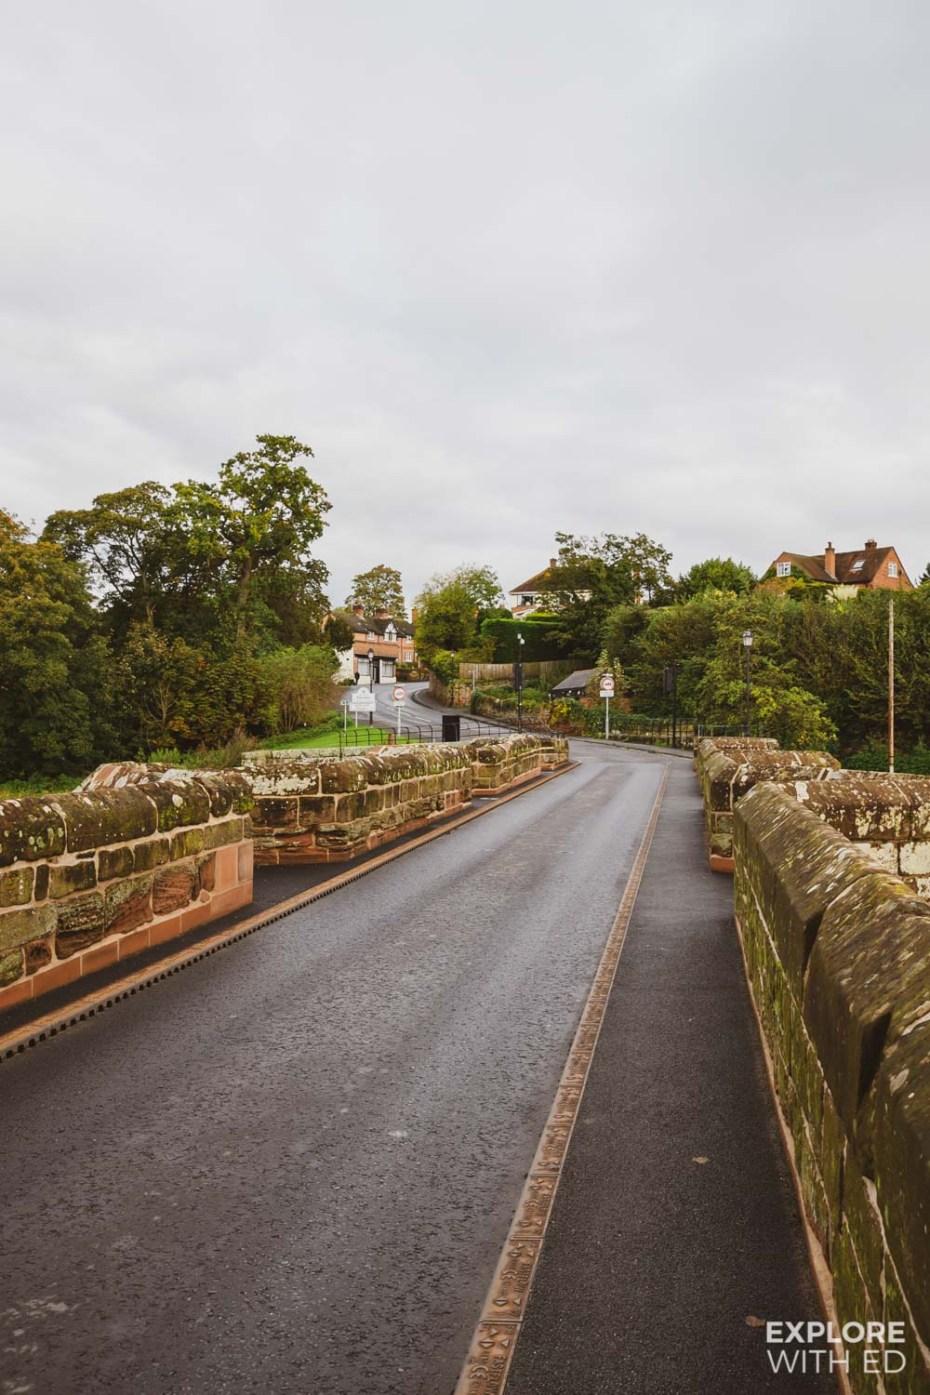 Farnham Bridge in Wrexham, the Gateway to Wales